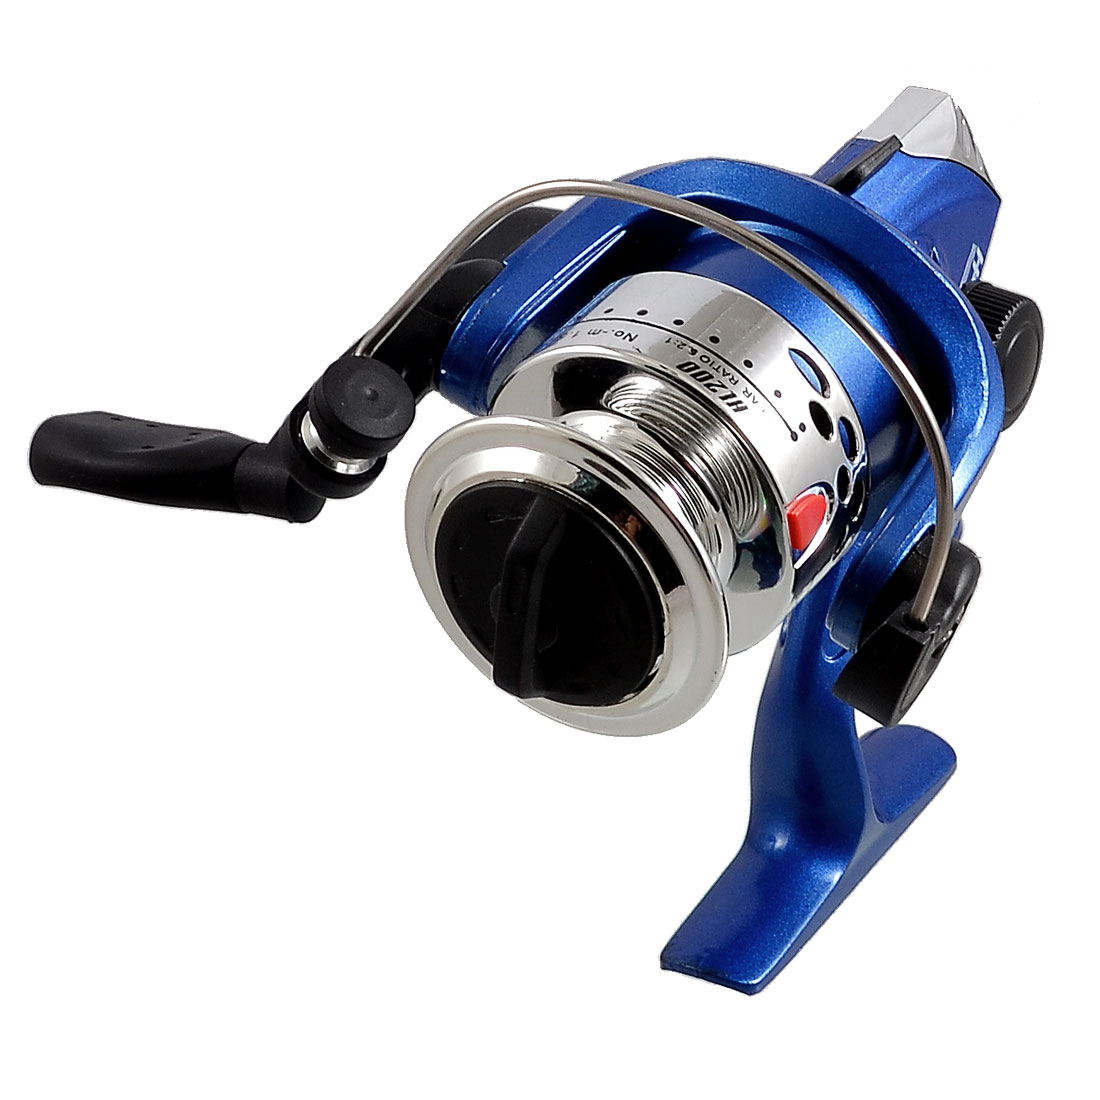 Foldable Handgrip Gear Ratio 2:1 3-Ball Bearings Fishing Spinning Reel HL200